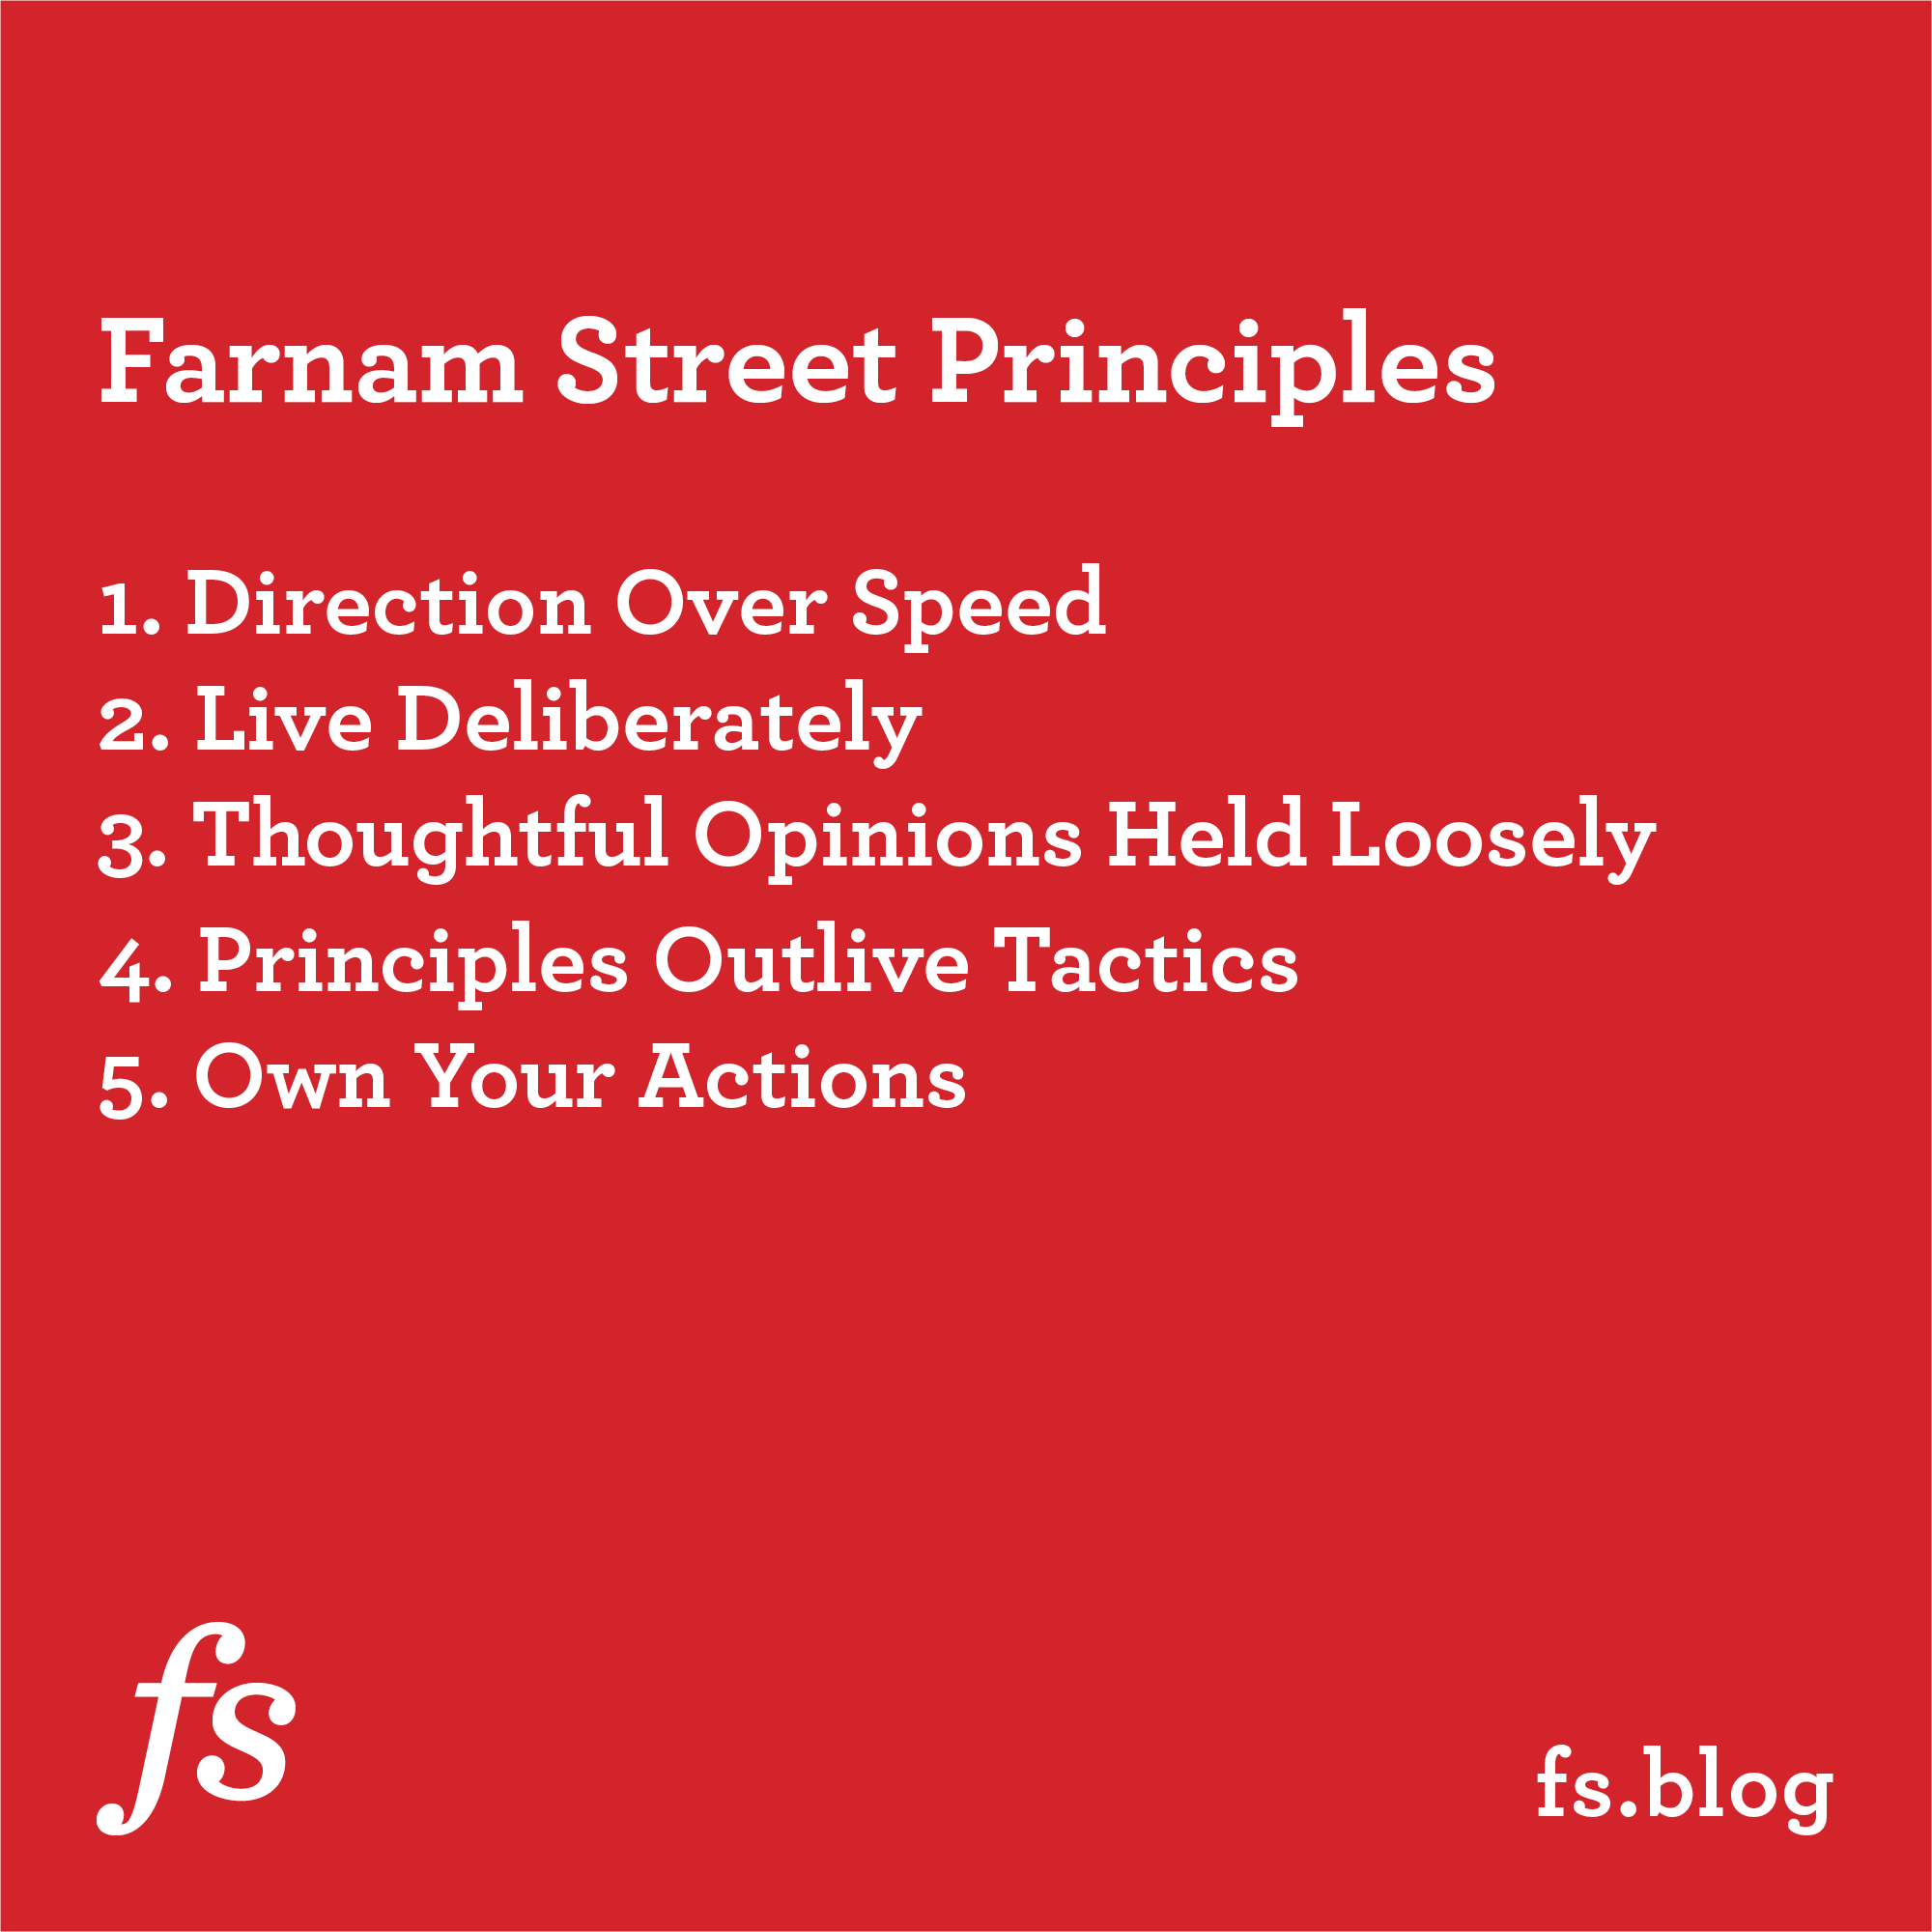 Farnam Street Principles